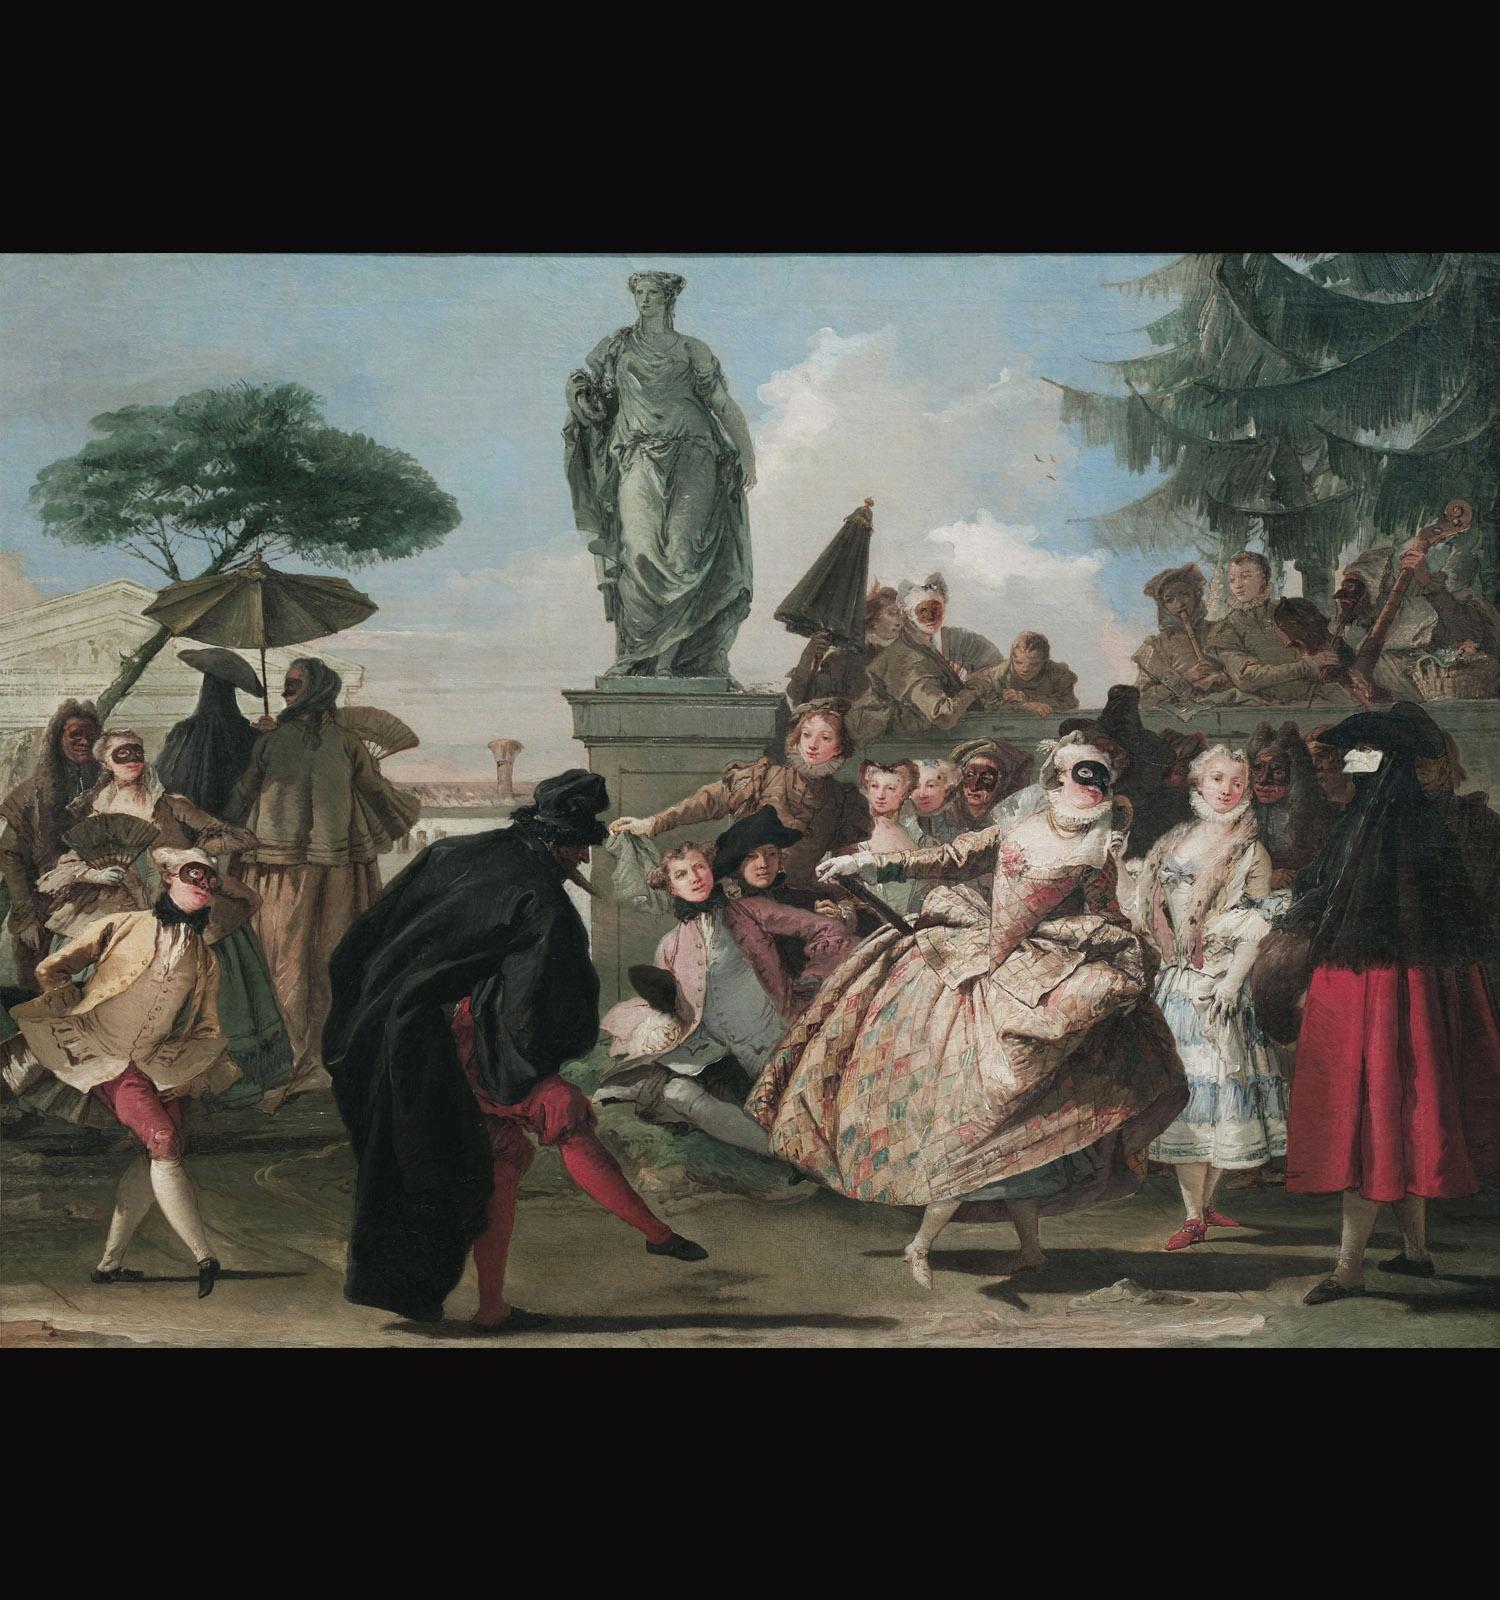 Giandominico Tiepolo, El Minuet